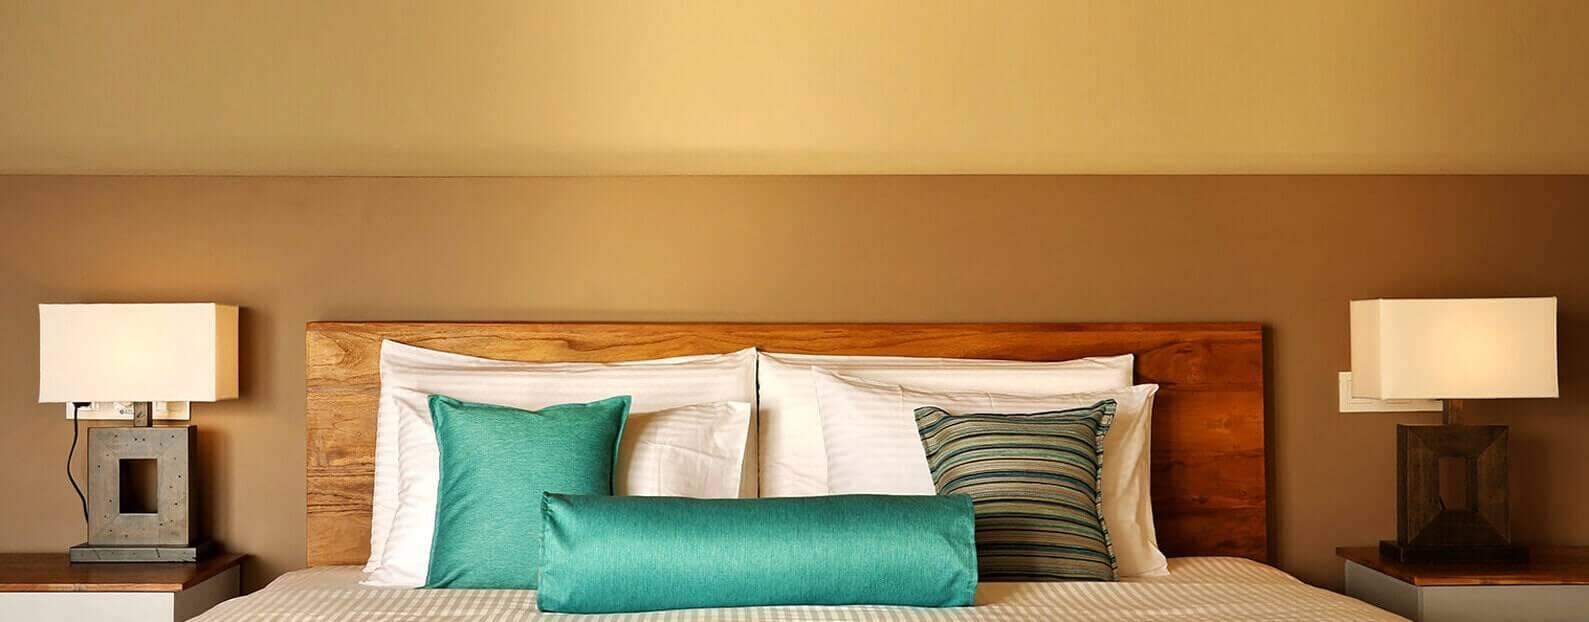 Oceanfront suites at Twenty Two Weligambay